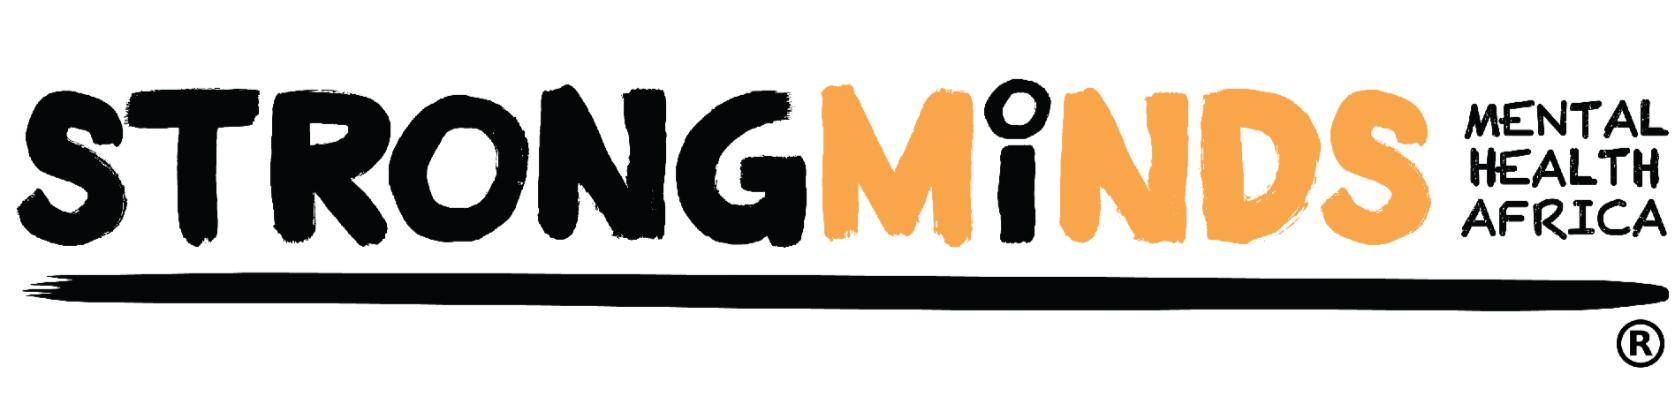 StrongMinds: Mental Health Africa